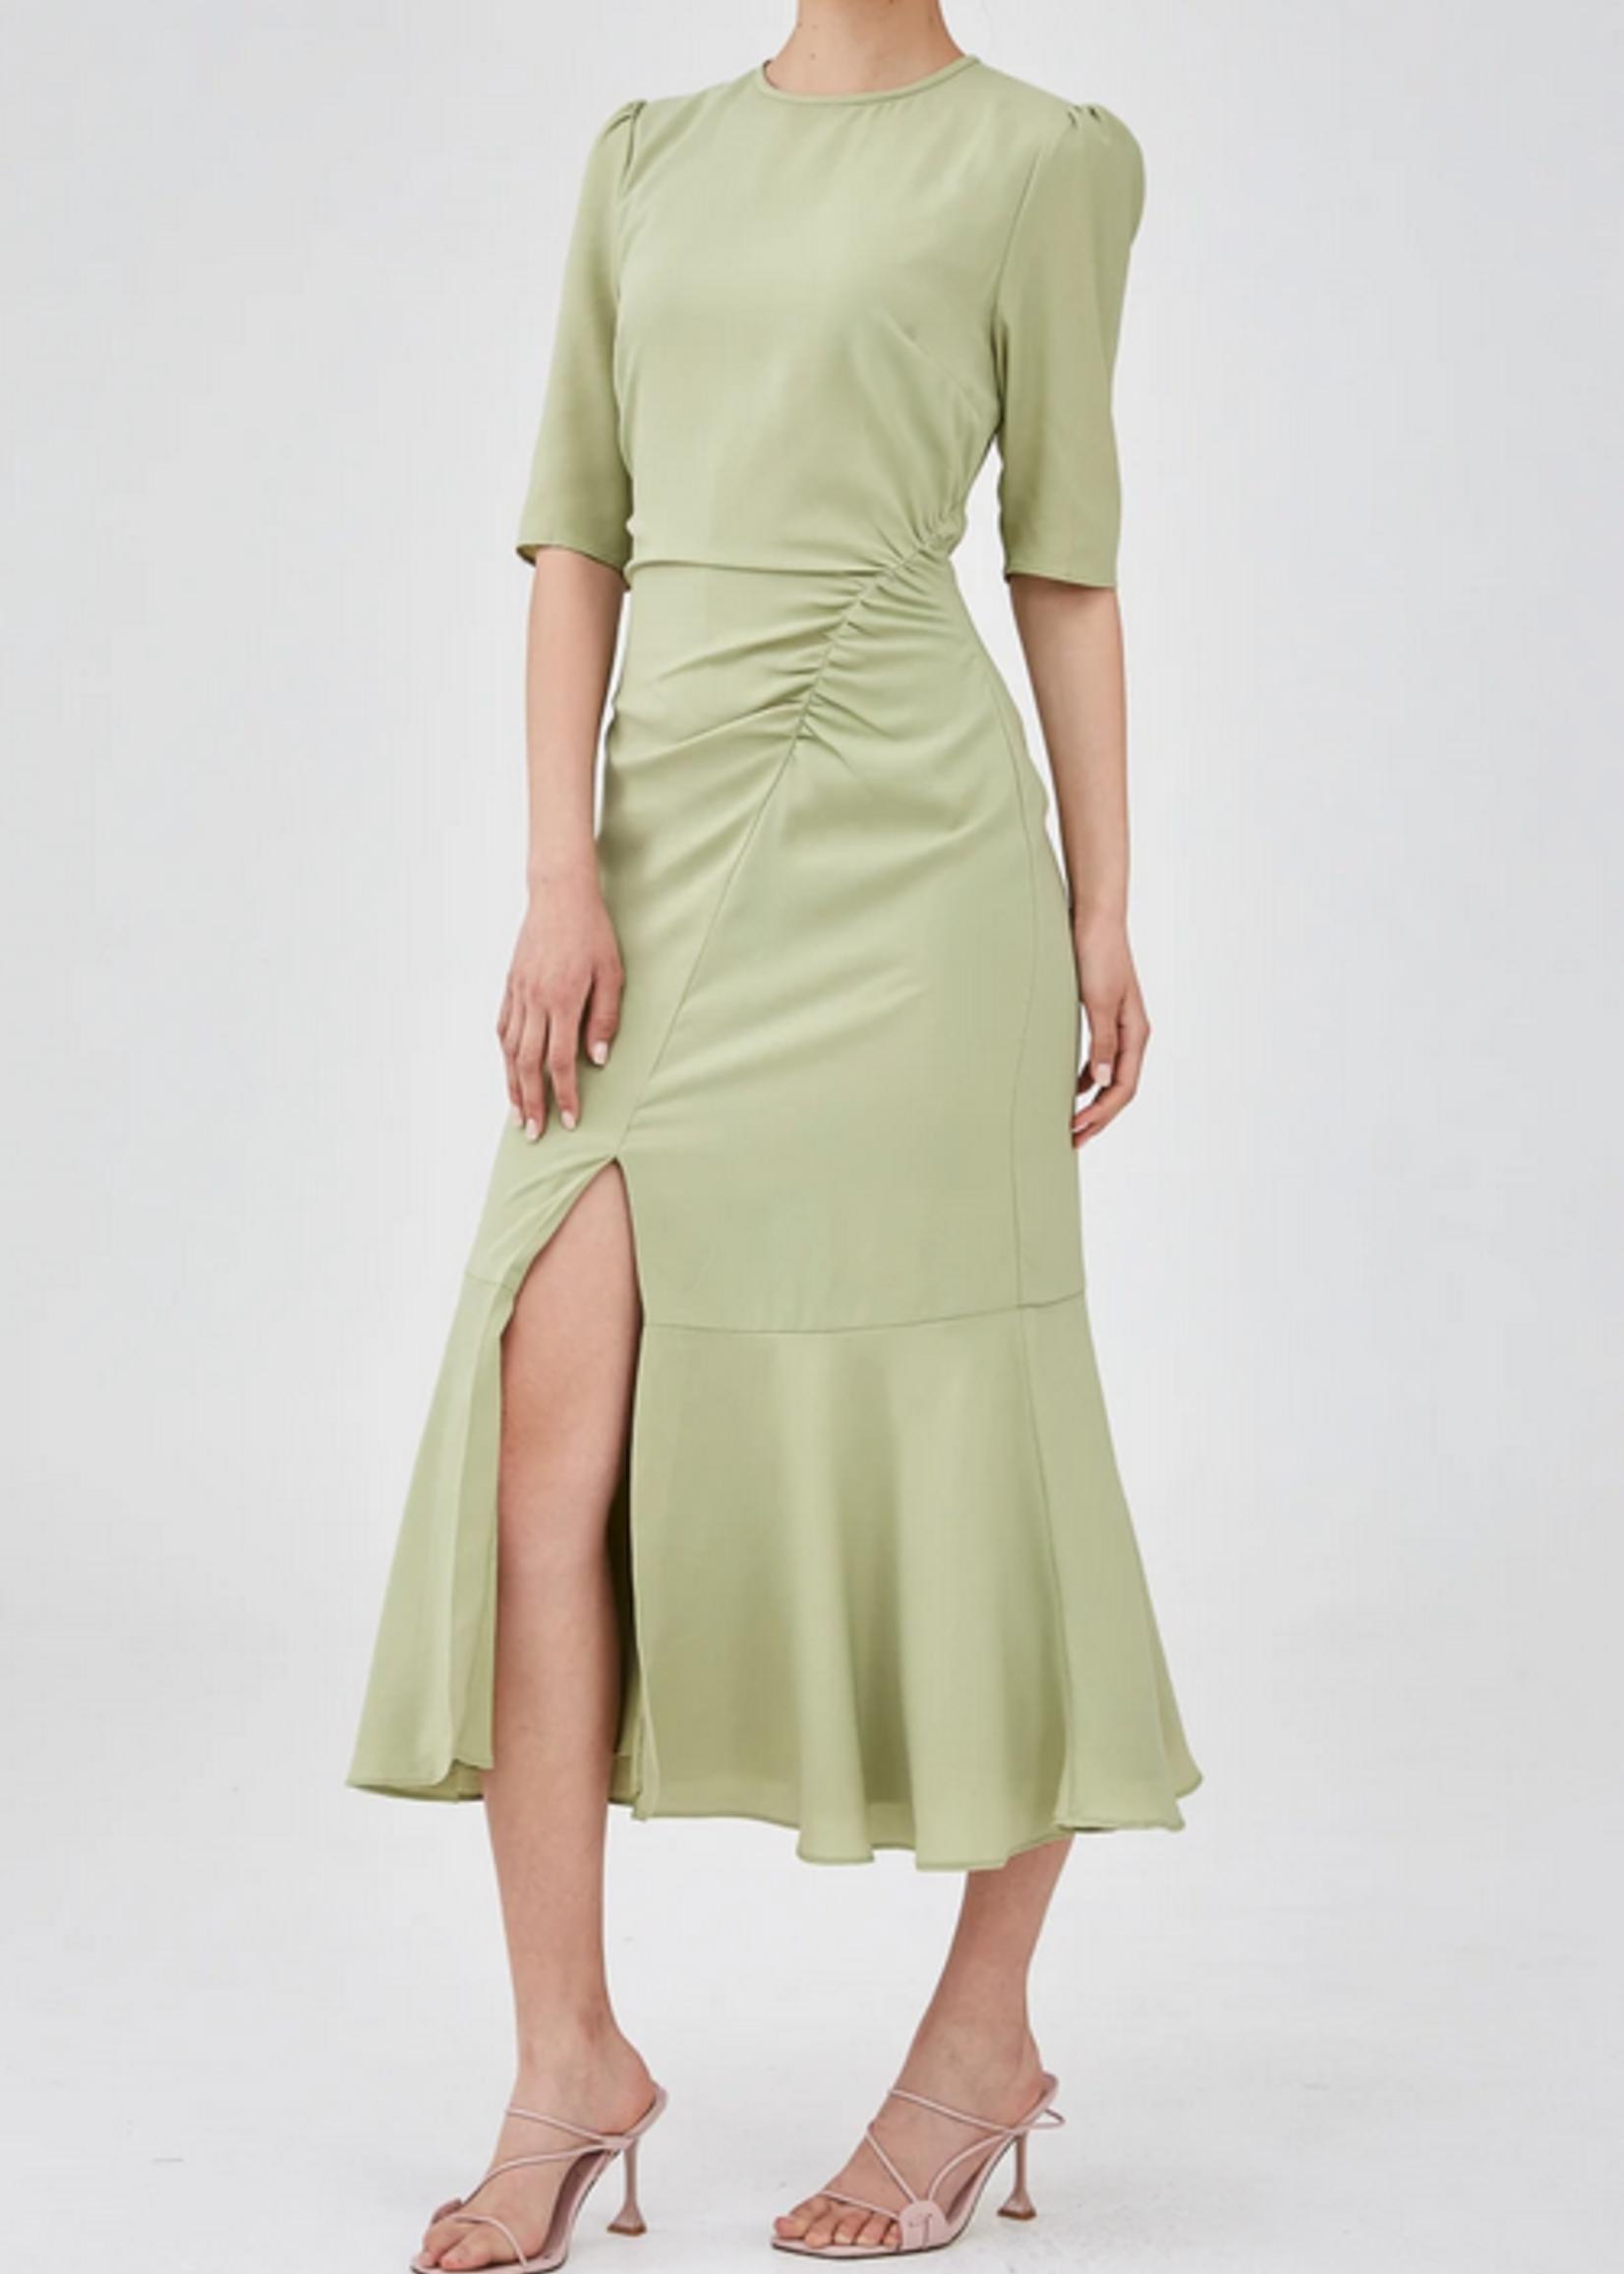 Elitaire Boutique Ruins Midi Dress In Sage